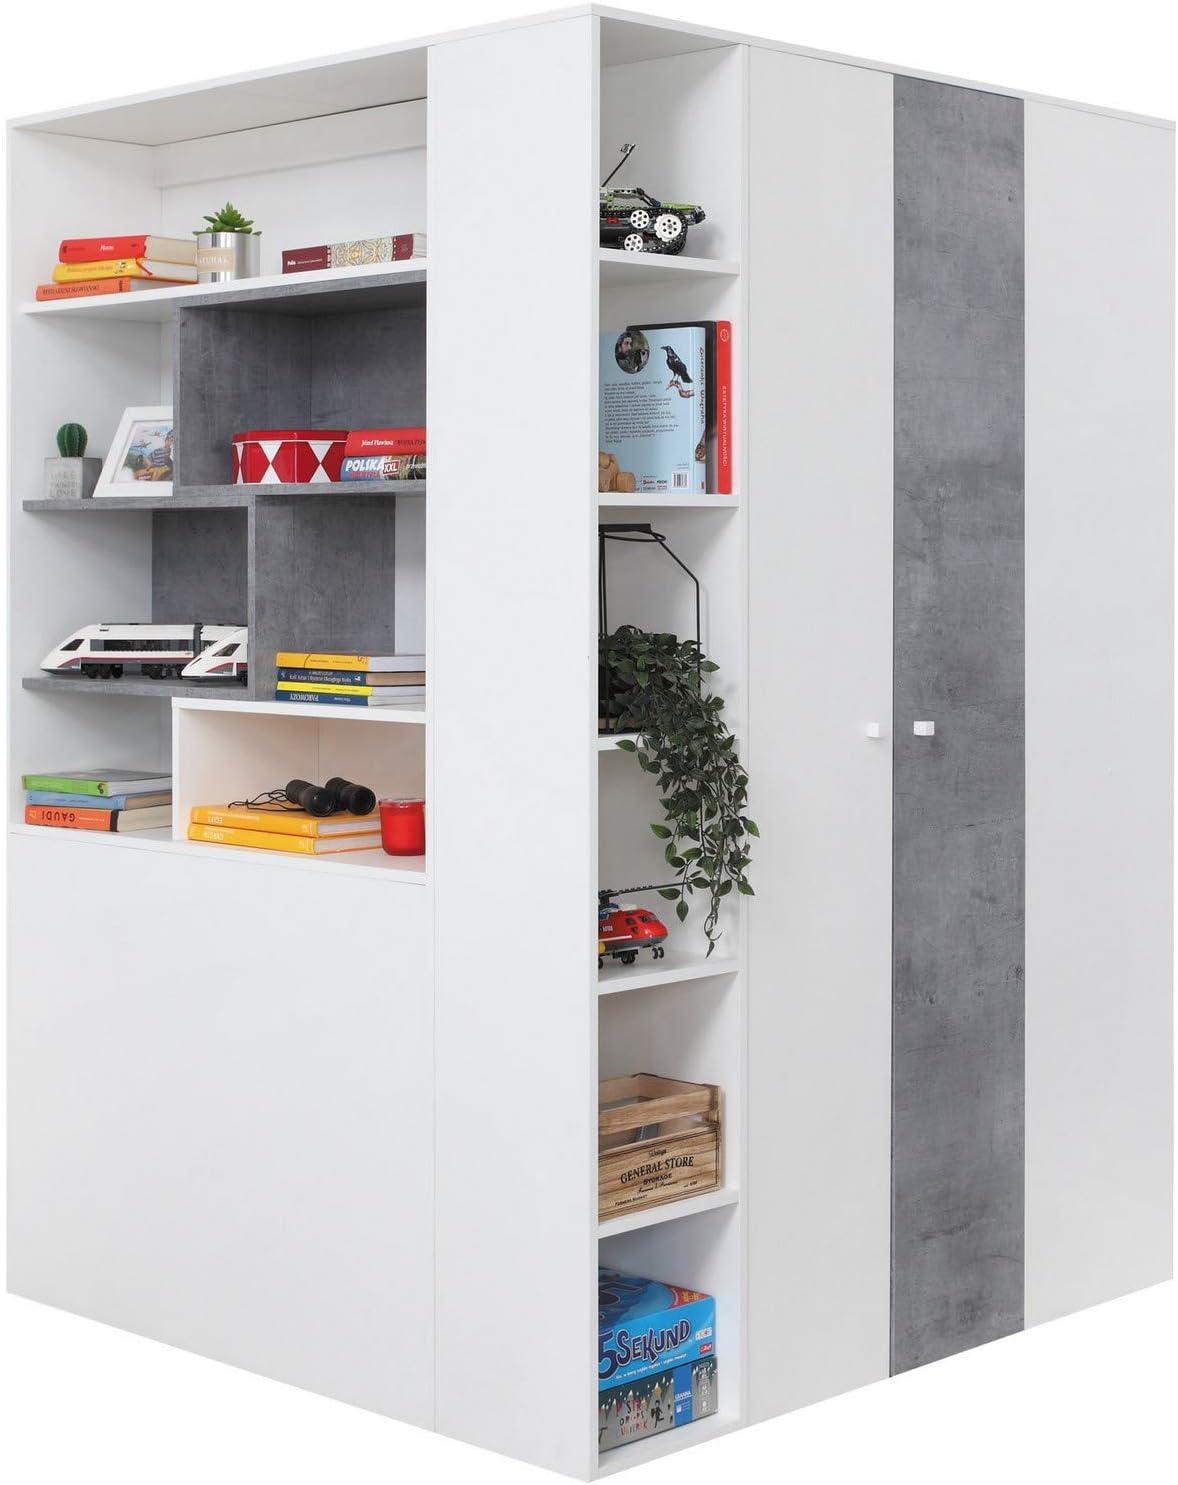 Furniture24 Eu Begehbarer Kleiderschrank Schrank Eckschrank